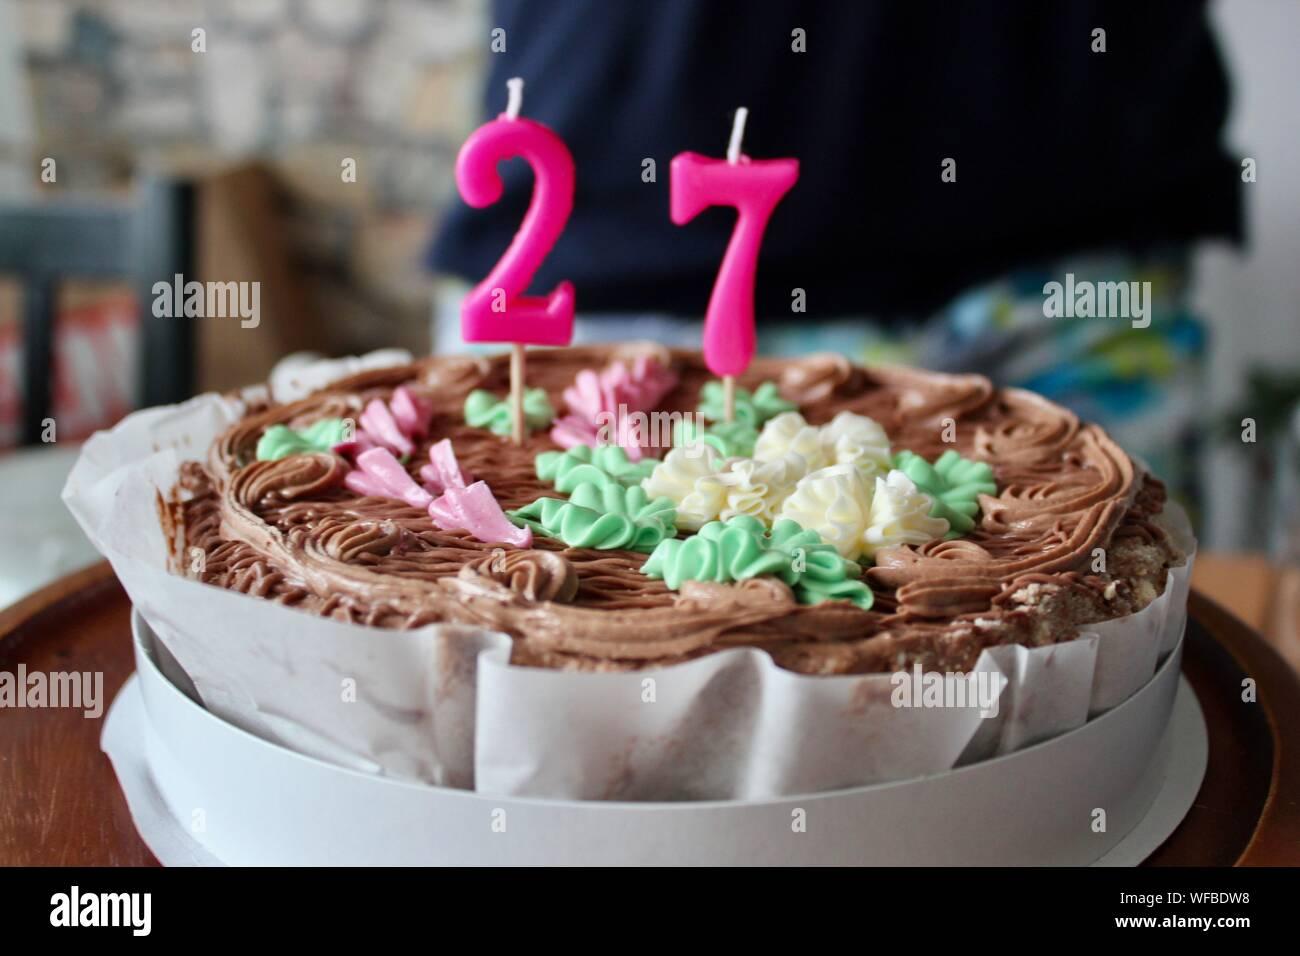 Stupendous Close Up Of Number 27 Candles On Birthday Cake Stock Photo Personalised Birthday Cards Akebfashionlily Jamesorg